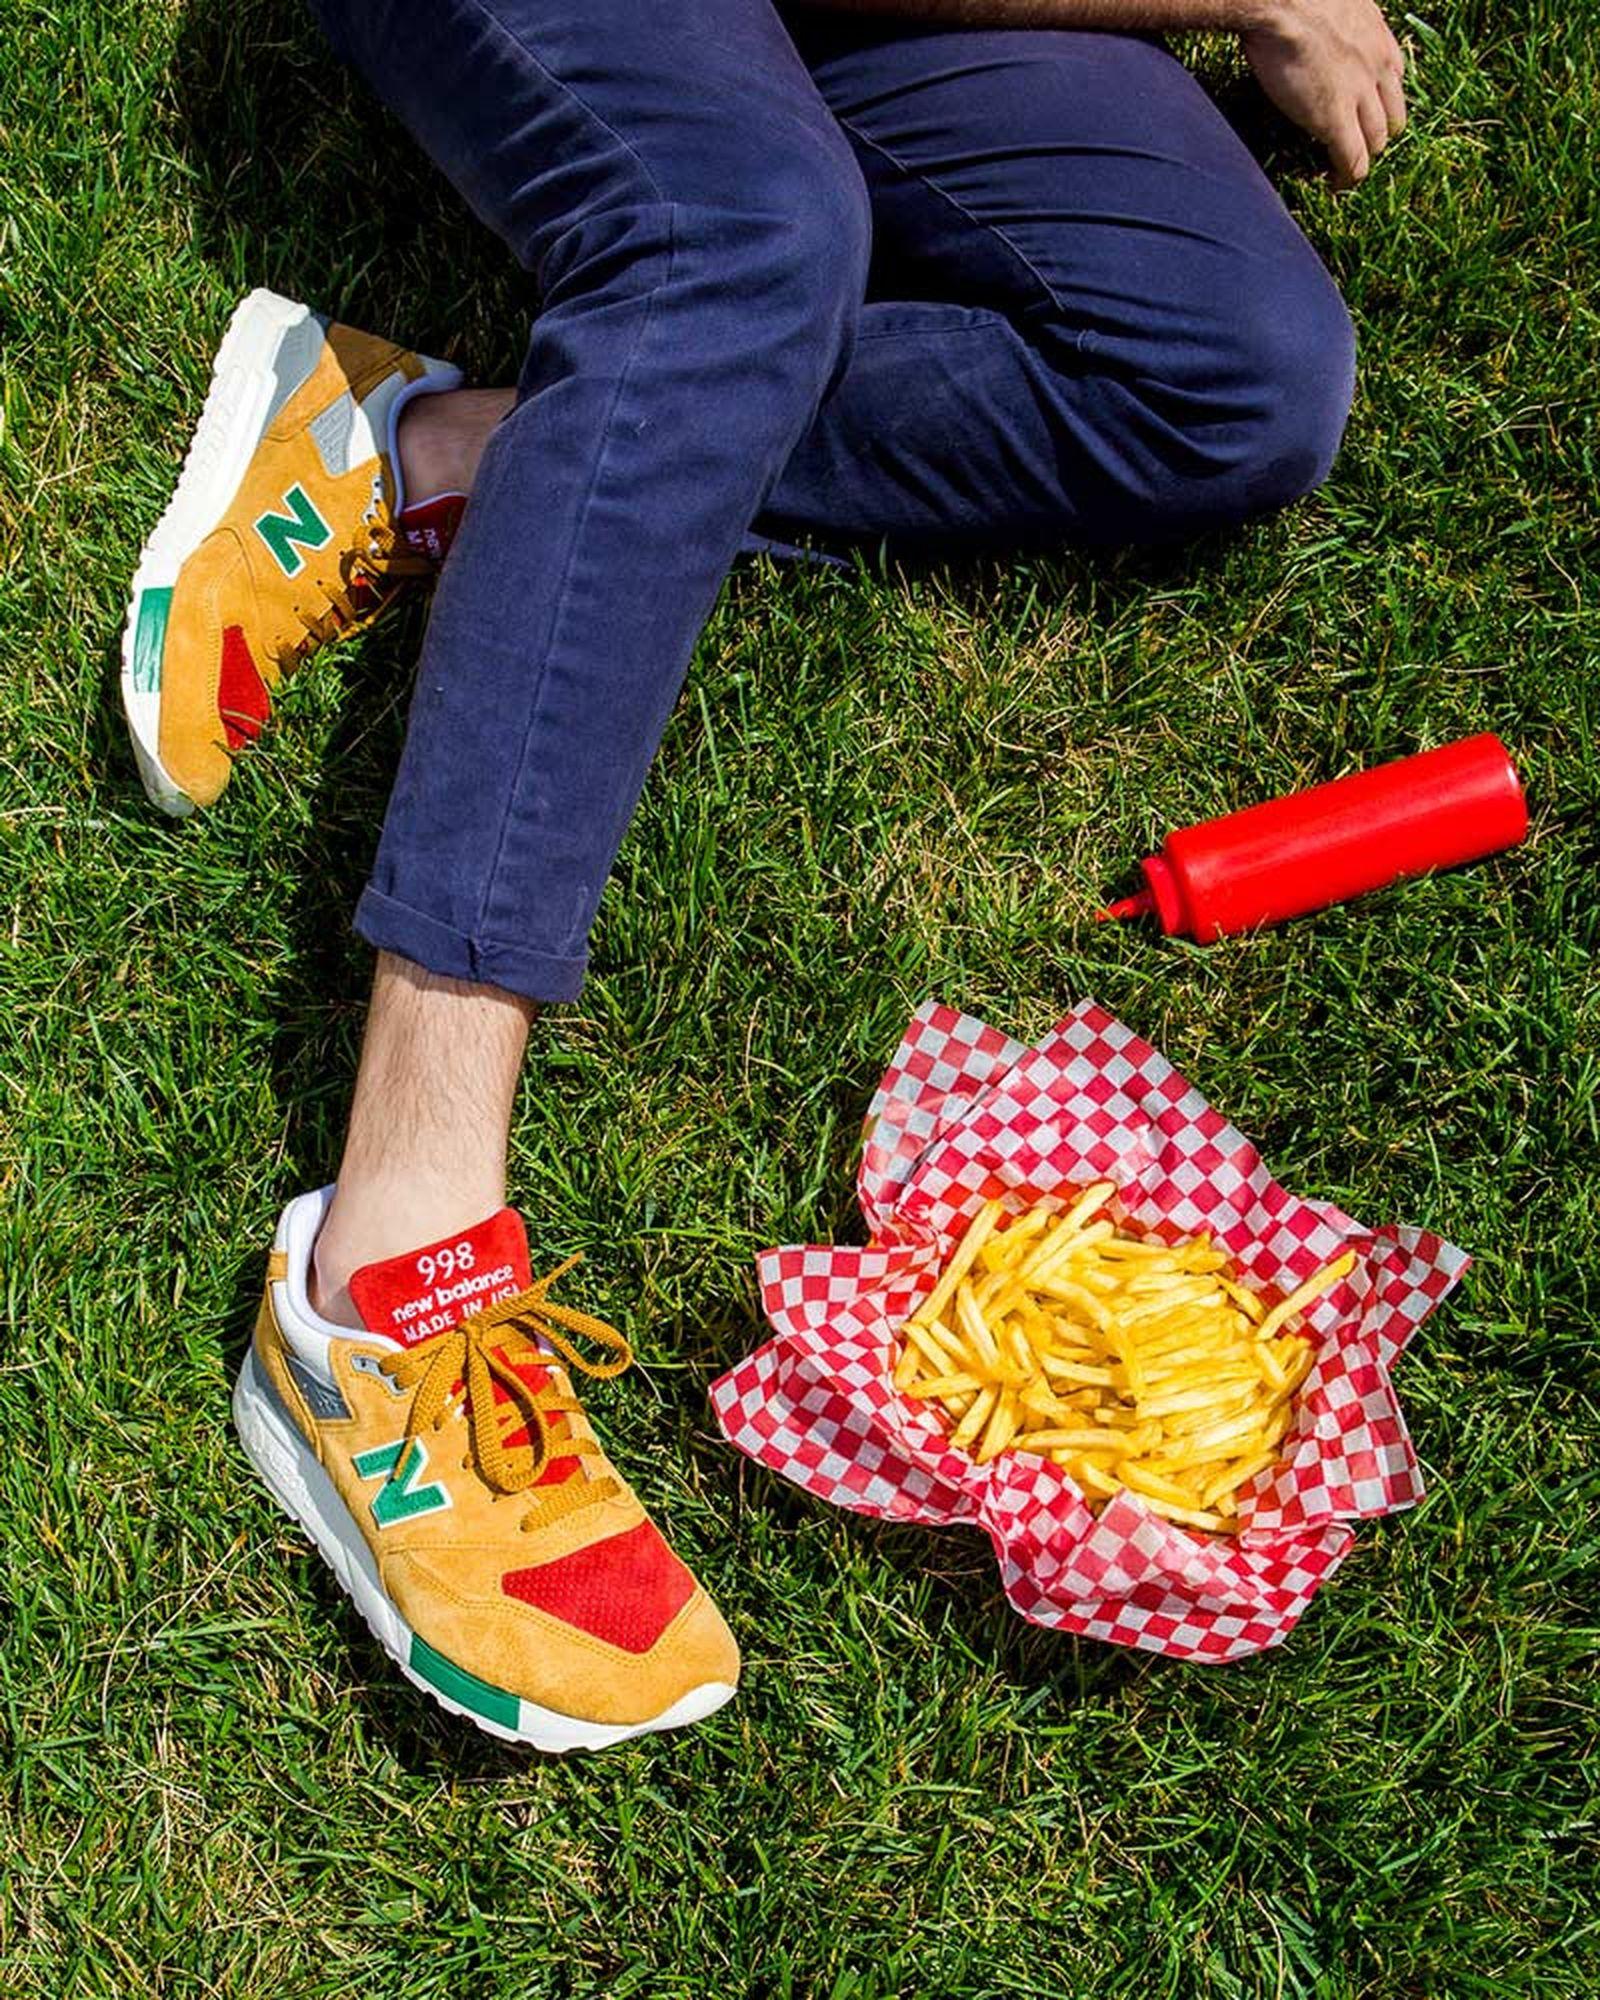 j crew new balance 998 mustard ketchup relish release date price j. crew